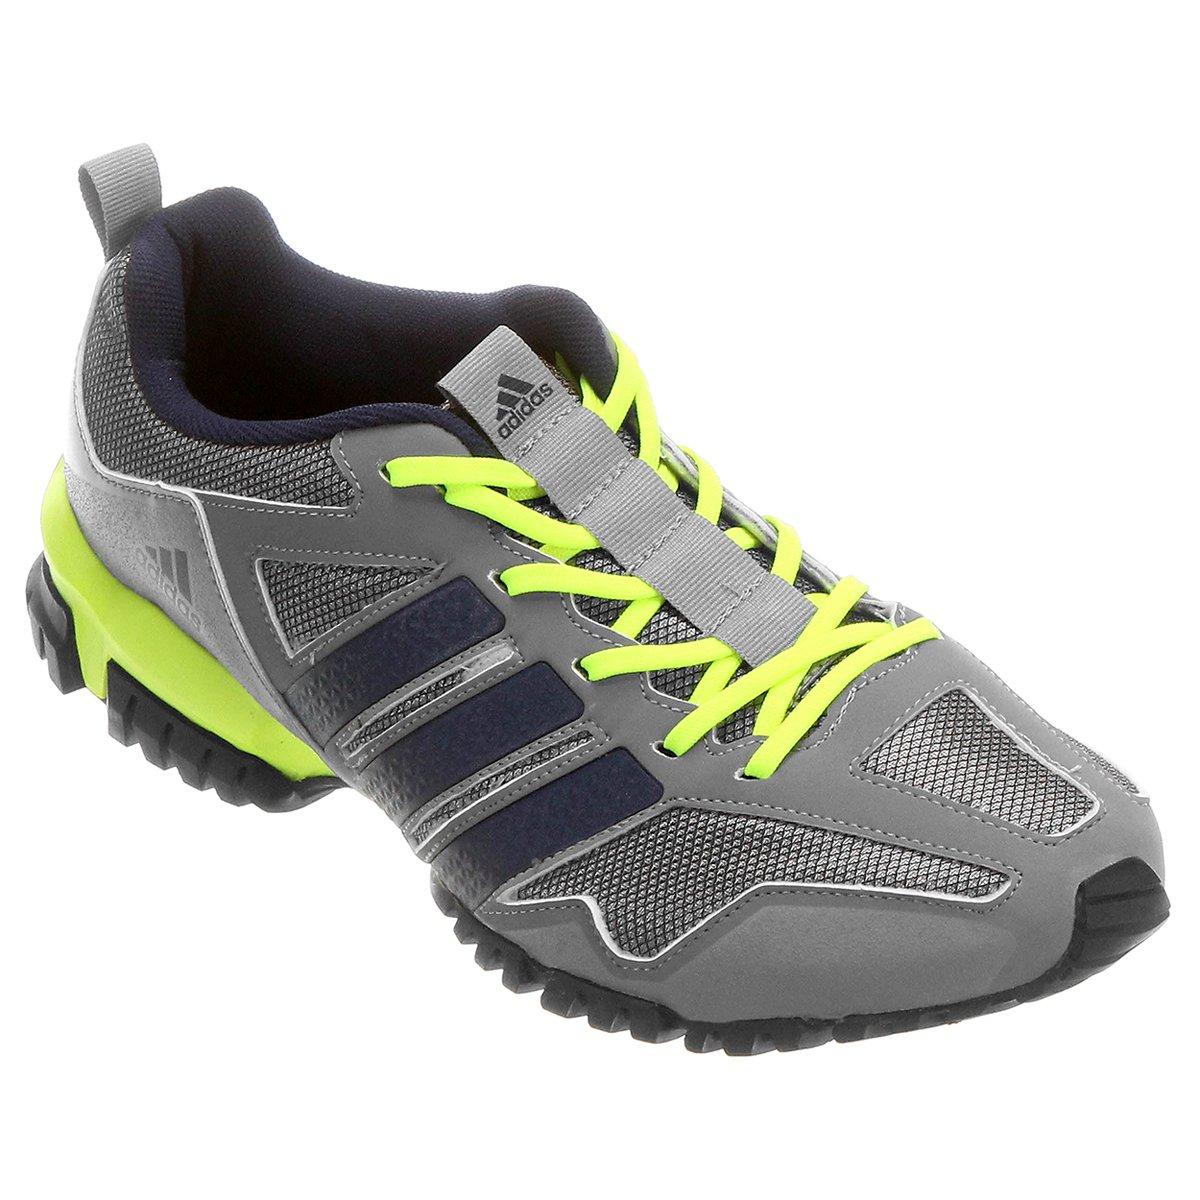 5a50d31d11a Tênis Adidas Aresta S Masculino - Compre Agora